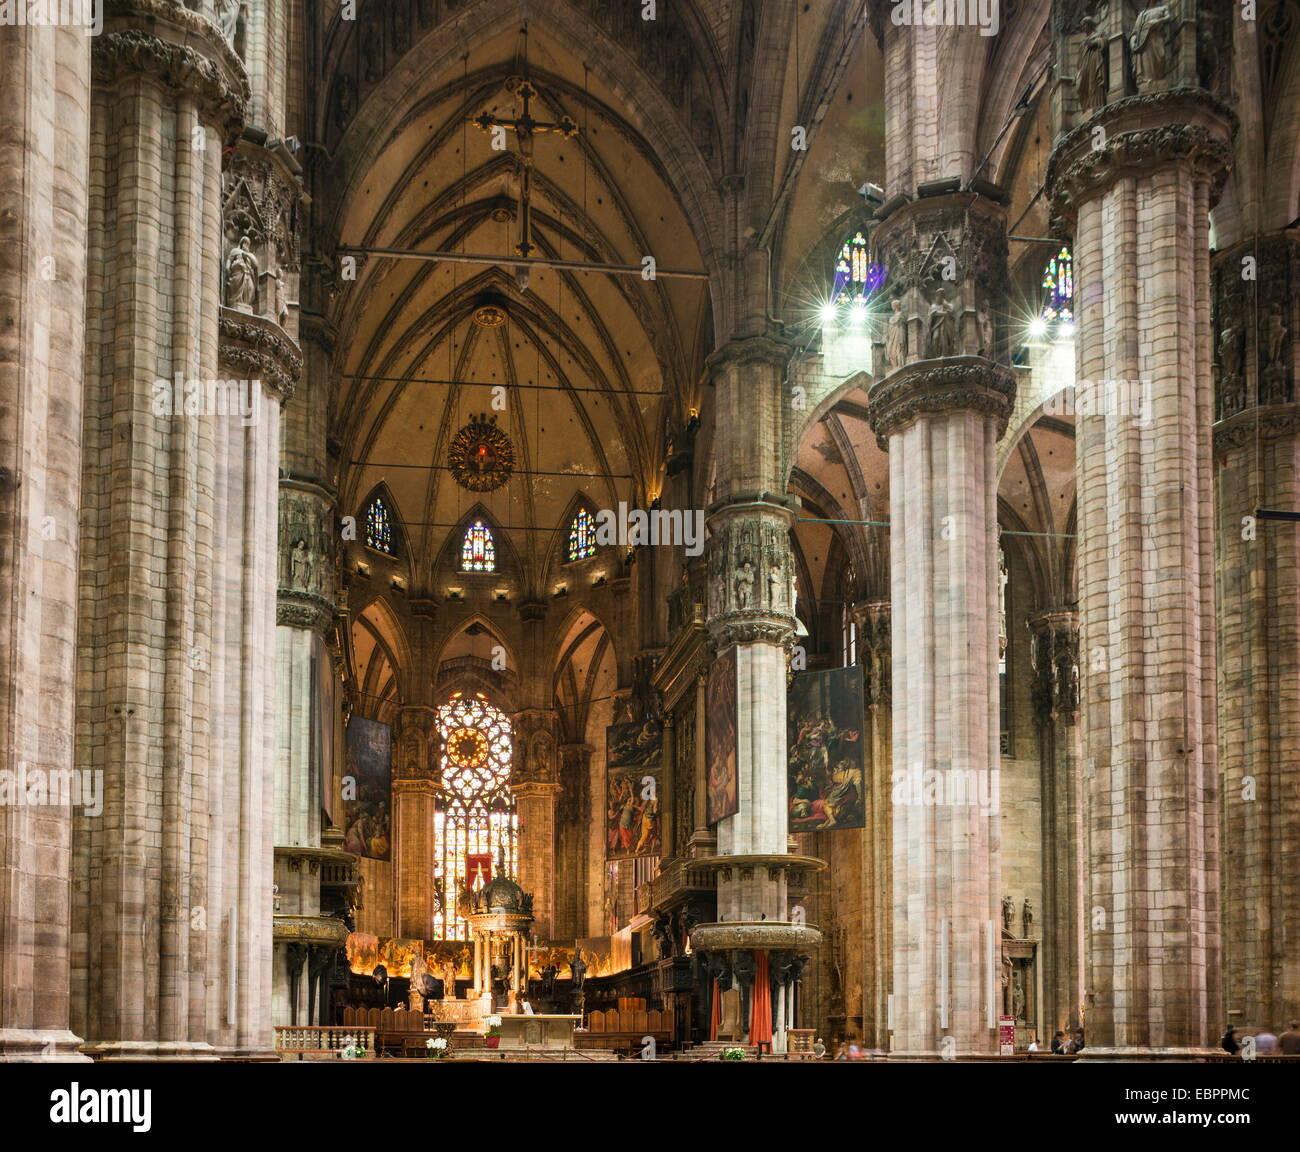 Intérieur de la cathédrale de Milan, Piazza Duomo, Milan, Lombardie, Italie, Europe Photo Stock